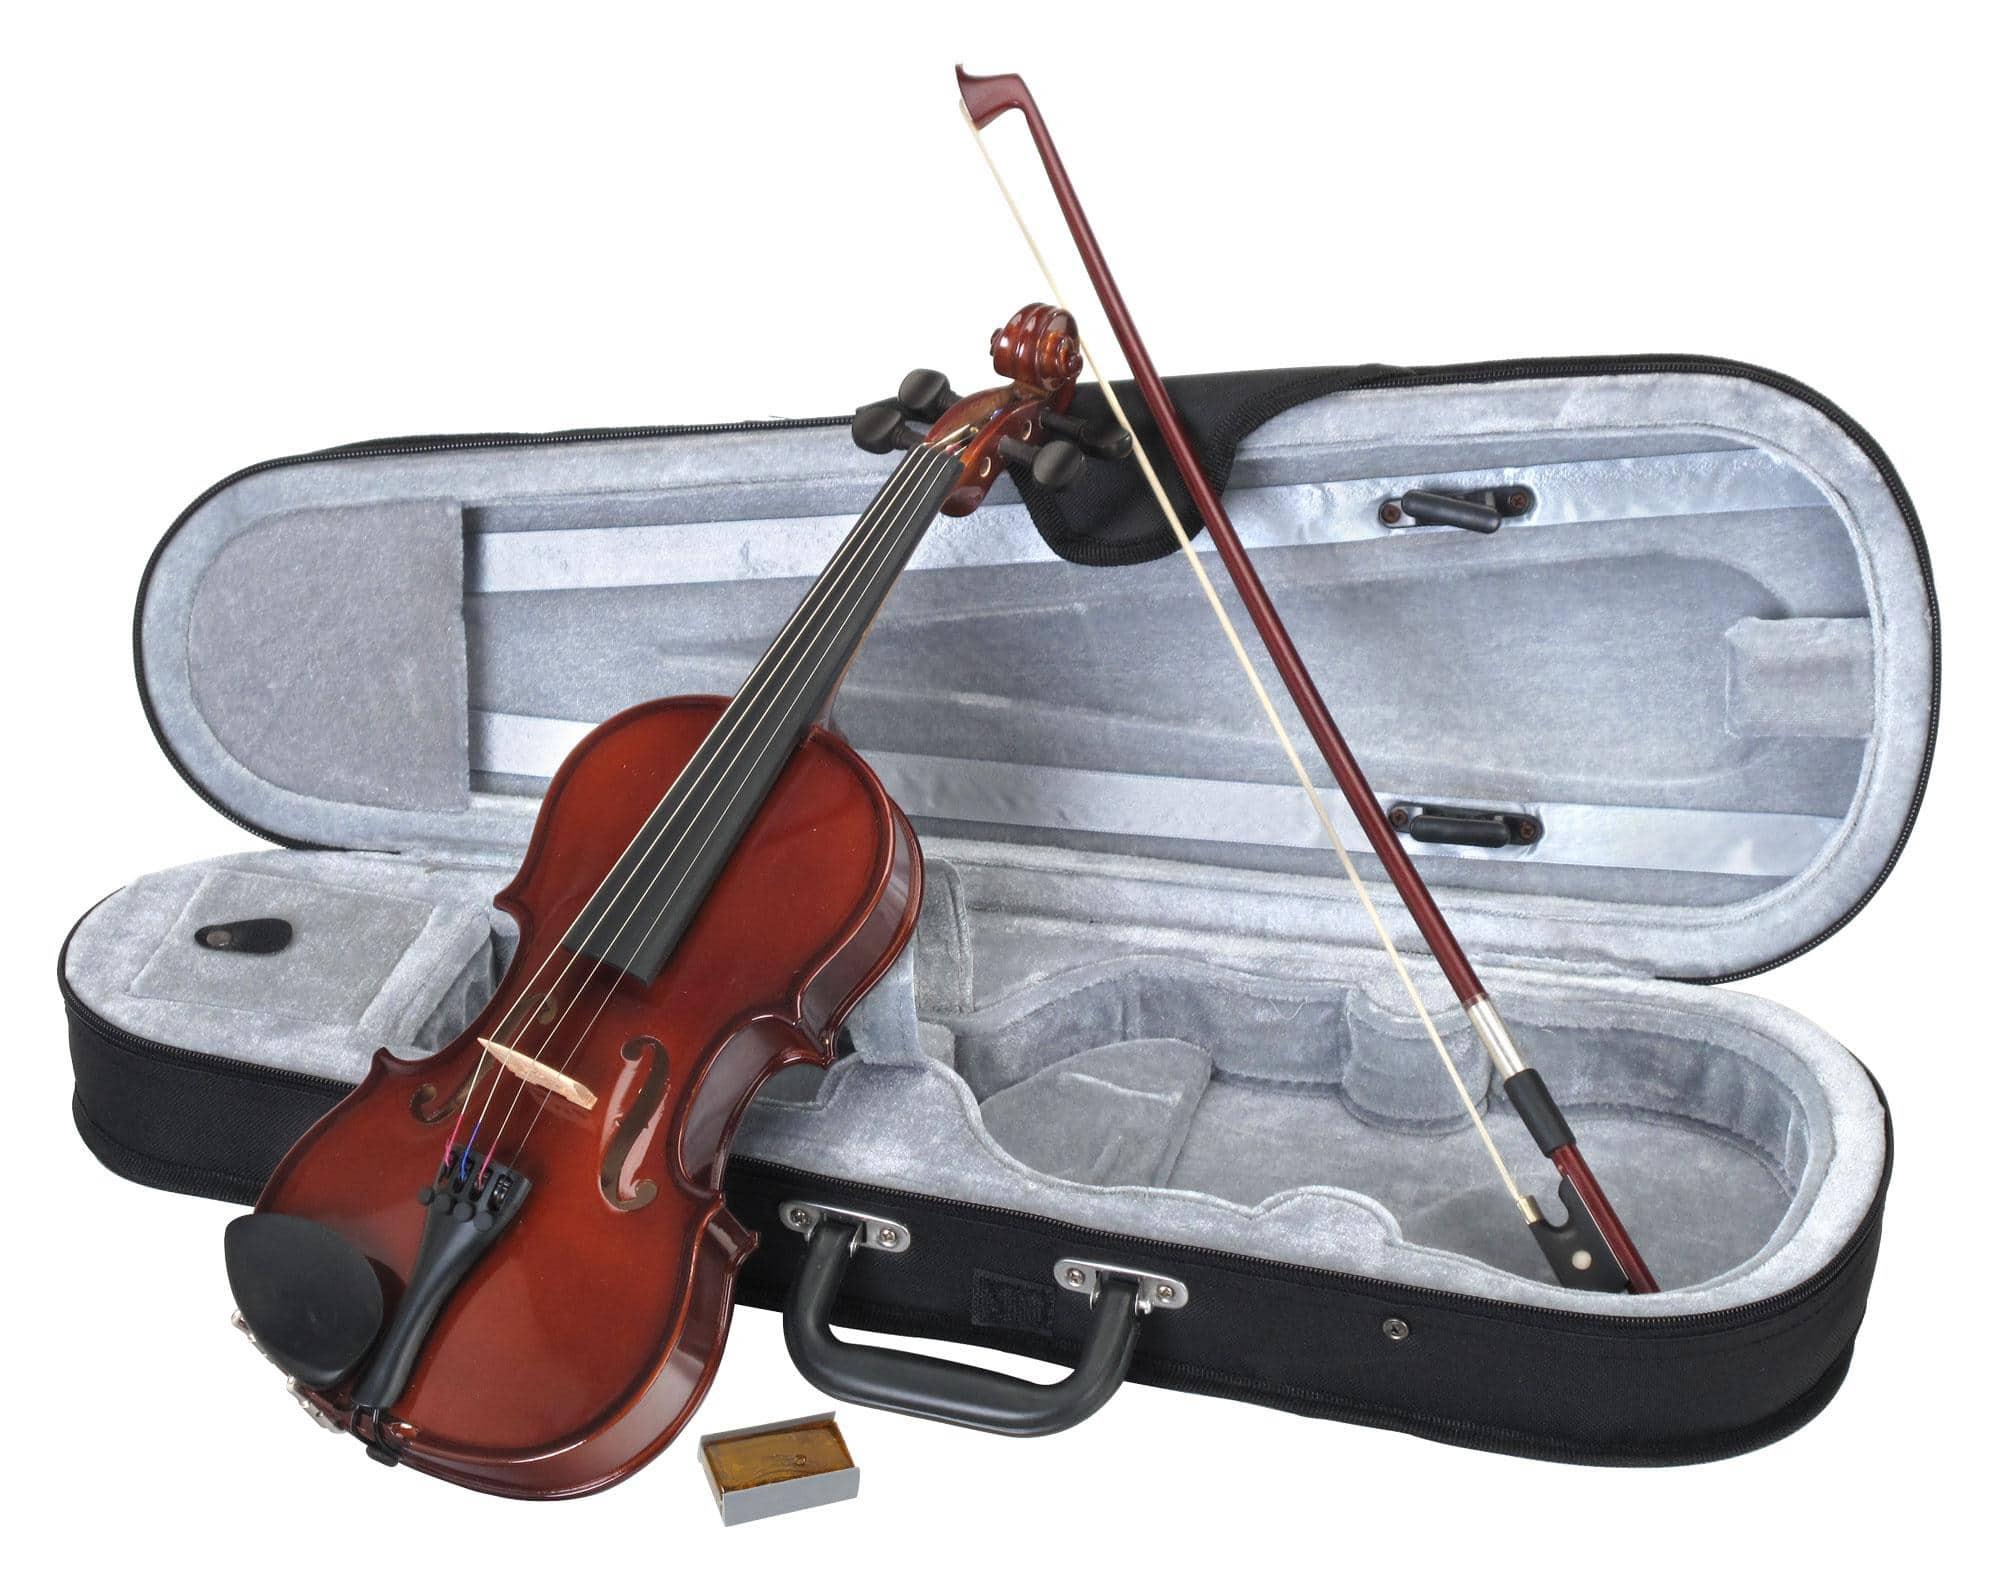 Violinen - Classic Cantabile Student Violinset 1|4 - Onlineshop Musikhaus Kirstein